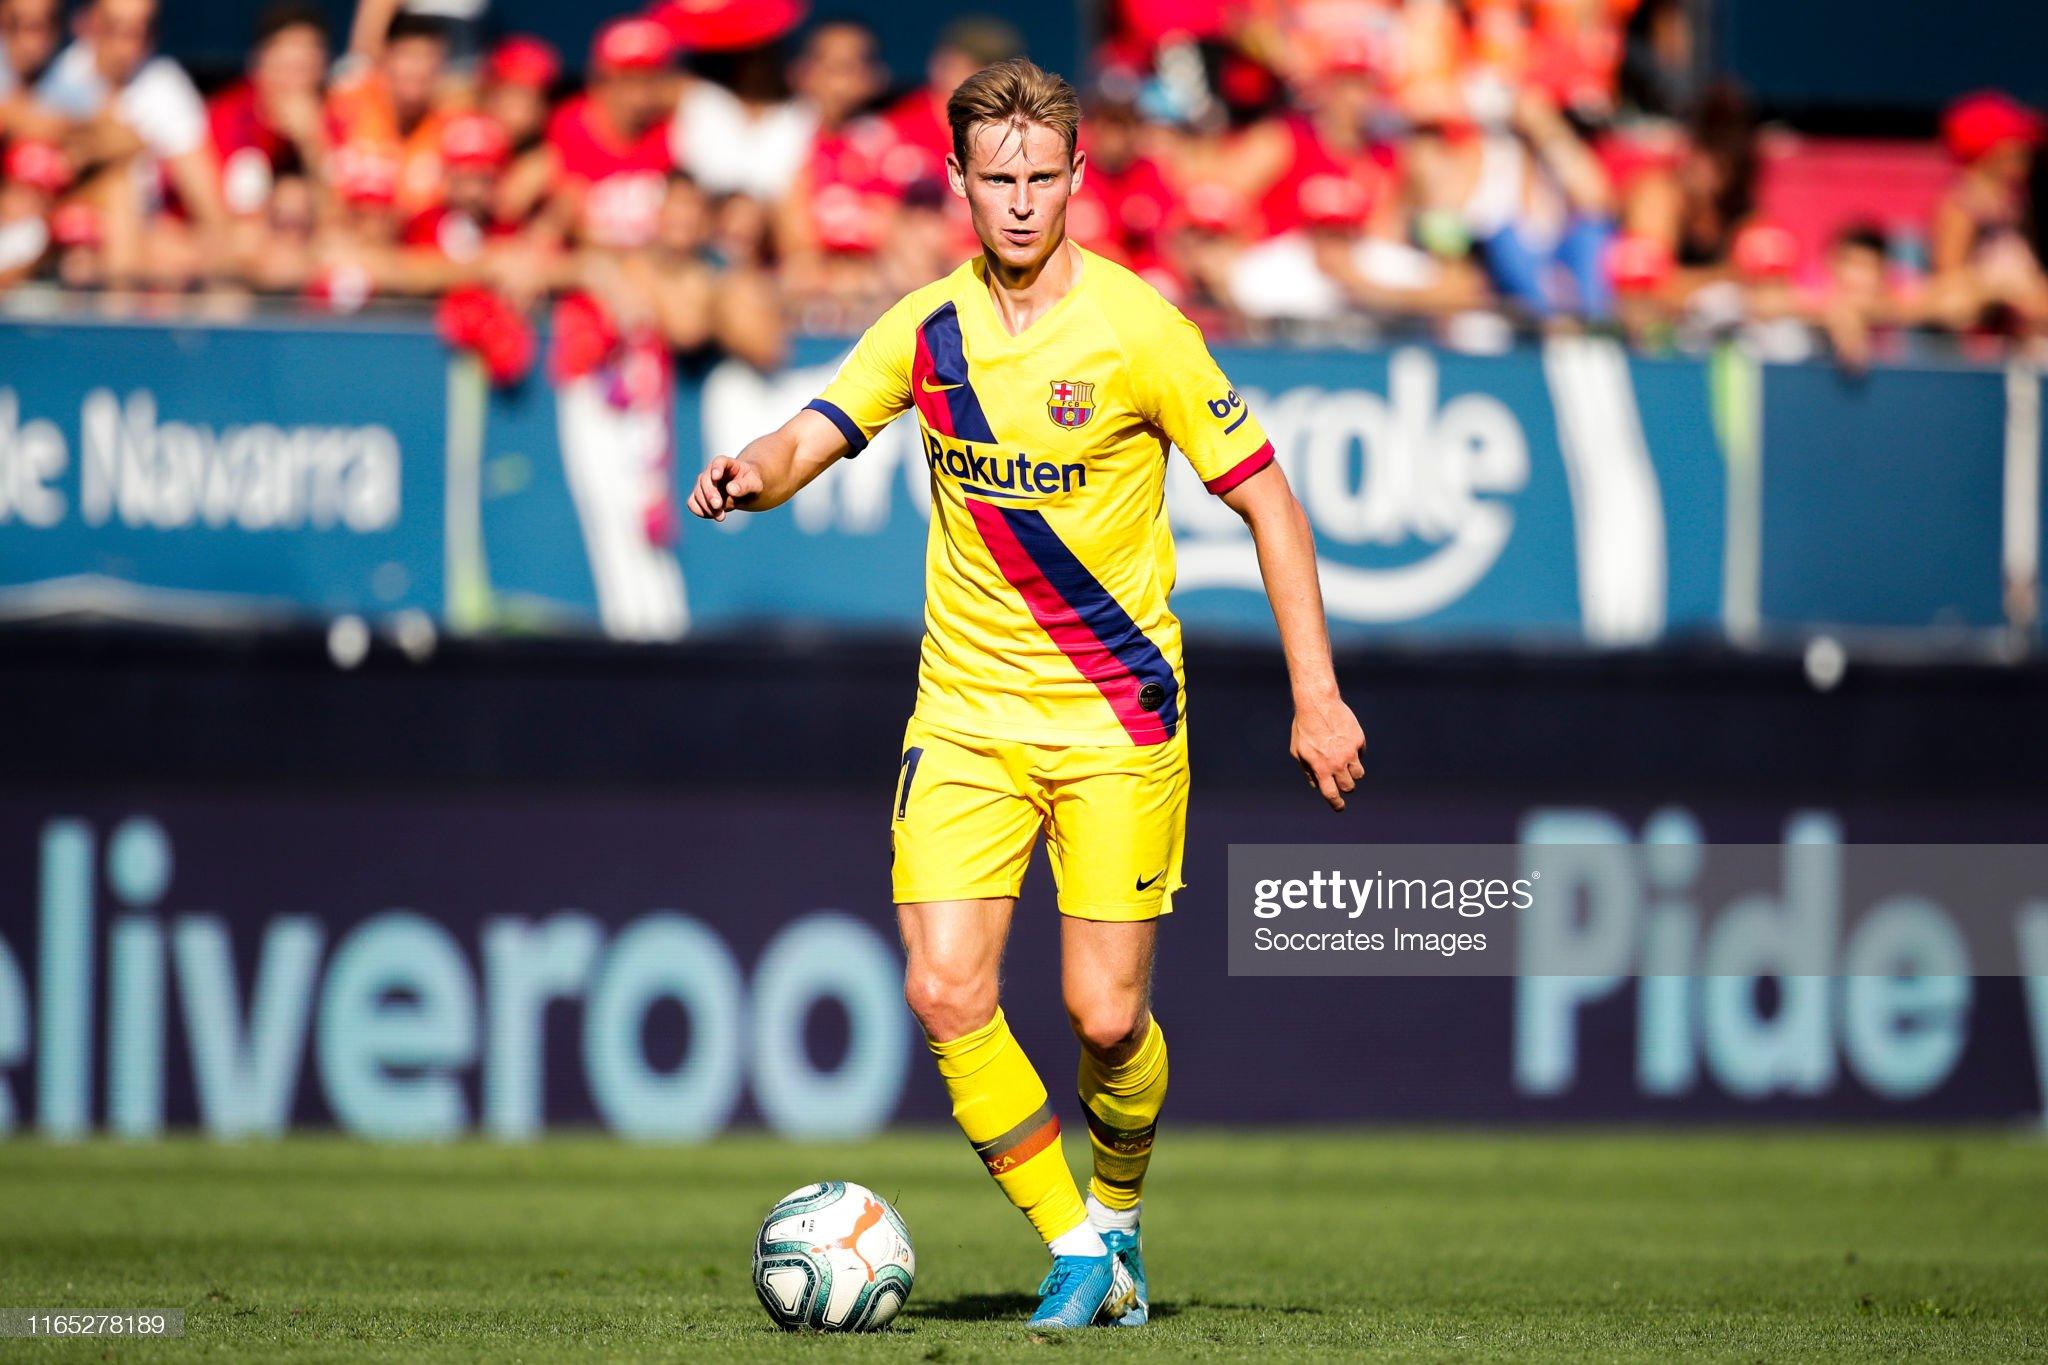 صور مباراة : أوساسونا - برشلونة 2-2 ( 31-08-2019 )  Frenkie-de-jong-of-fc-barcelona-during-the-la-liga-santander-match-picture-id1165278189?s=2048x2048